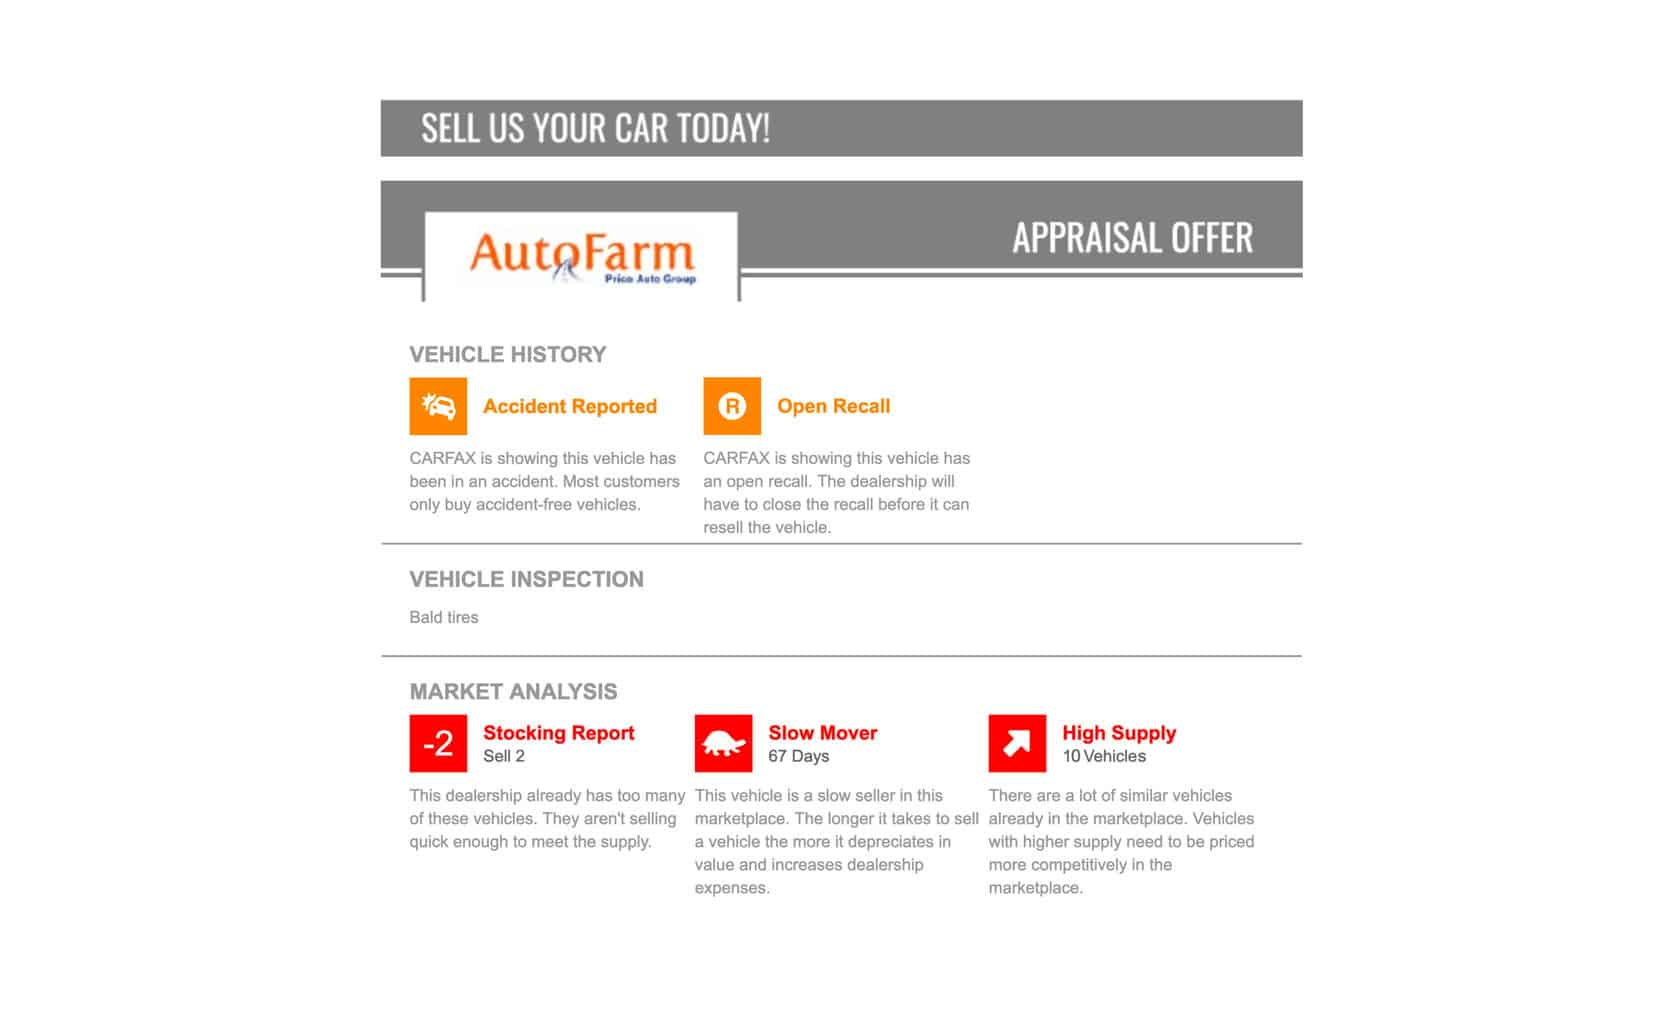 trade-in appraisal